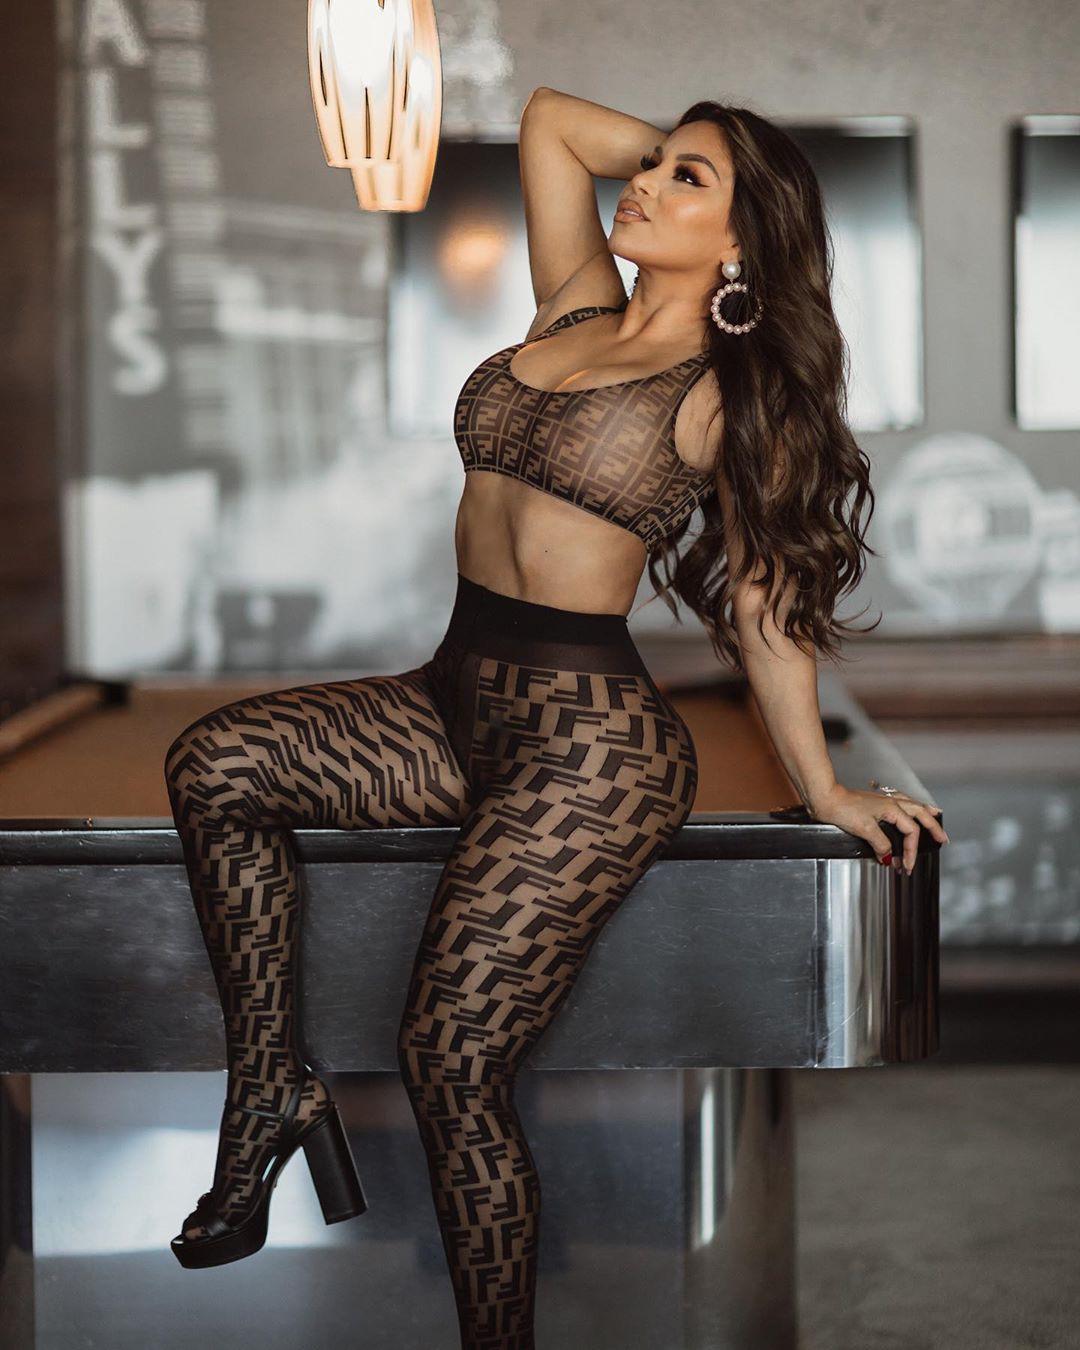 Dolly Castro undergarment, lingerie sportswear, tights lookbook dress